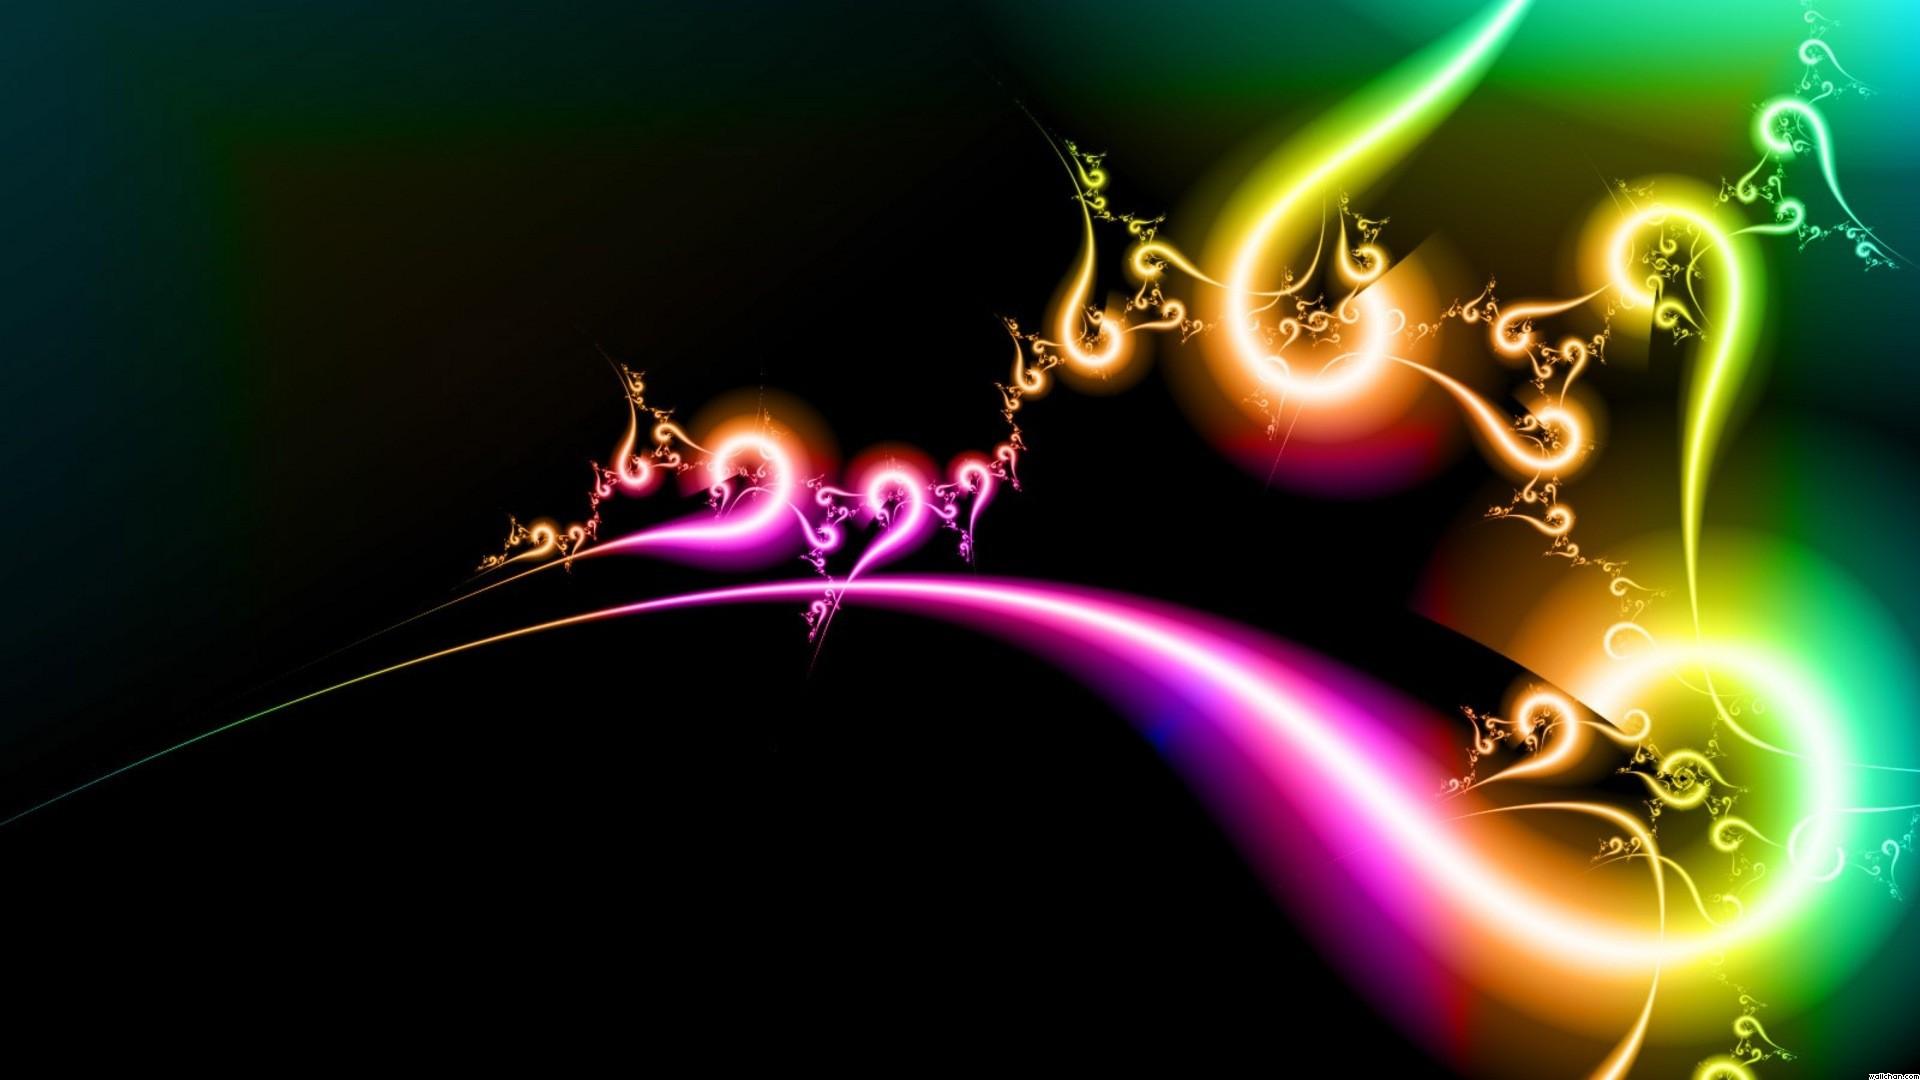 Rainbow Colors Wallpaper – Wallpapers Wallpaper (28469281) – Fanpop